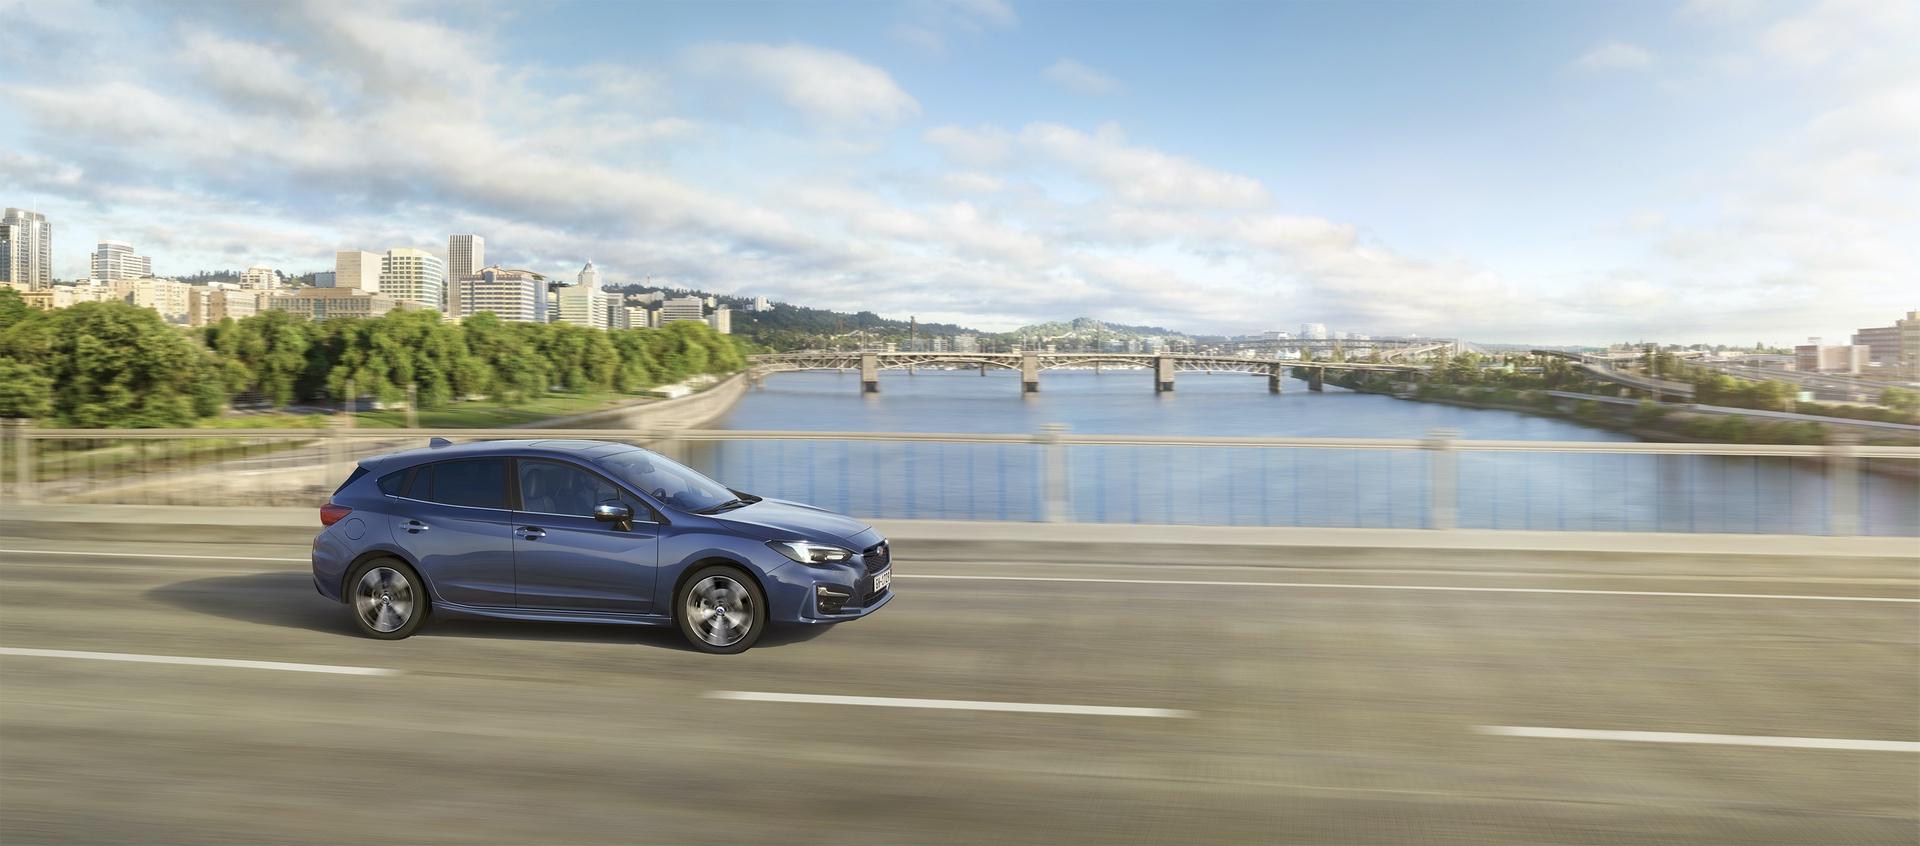 First_Drive_Subaru_Impreza_0002